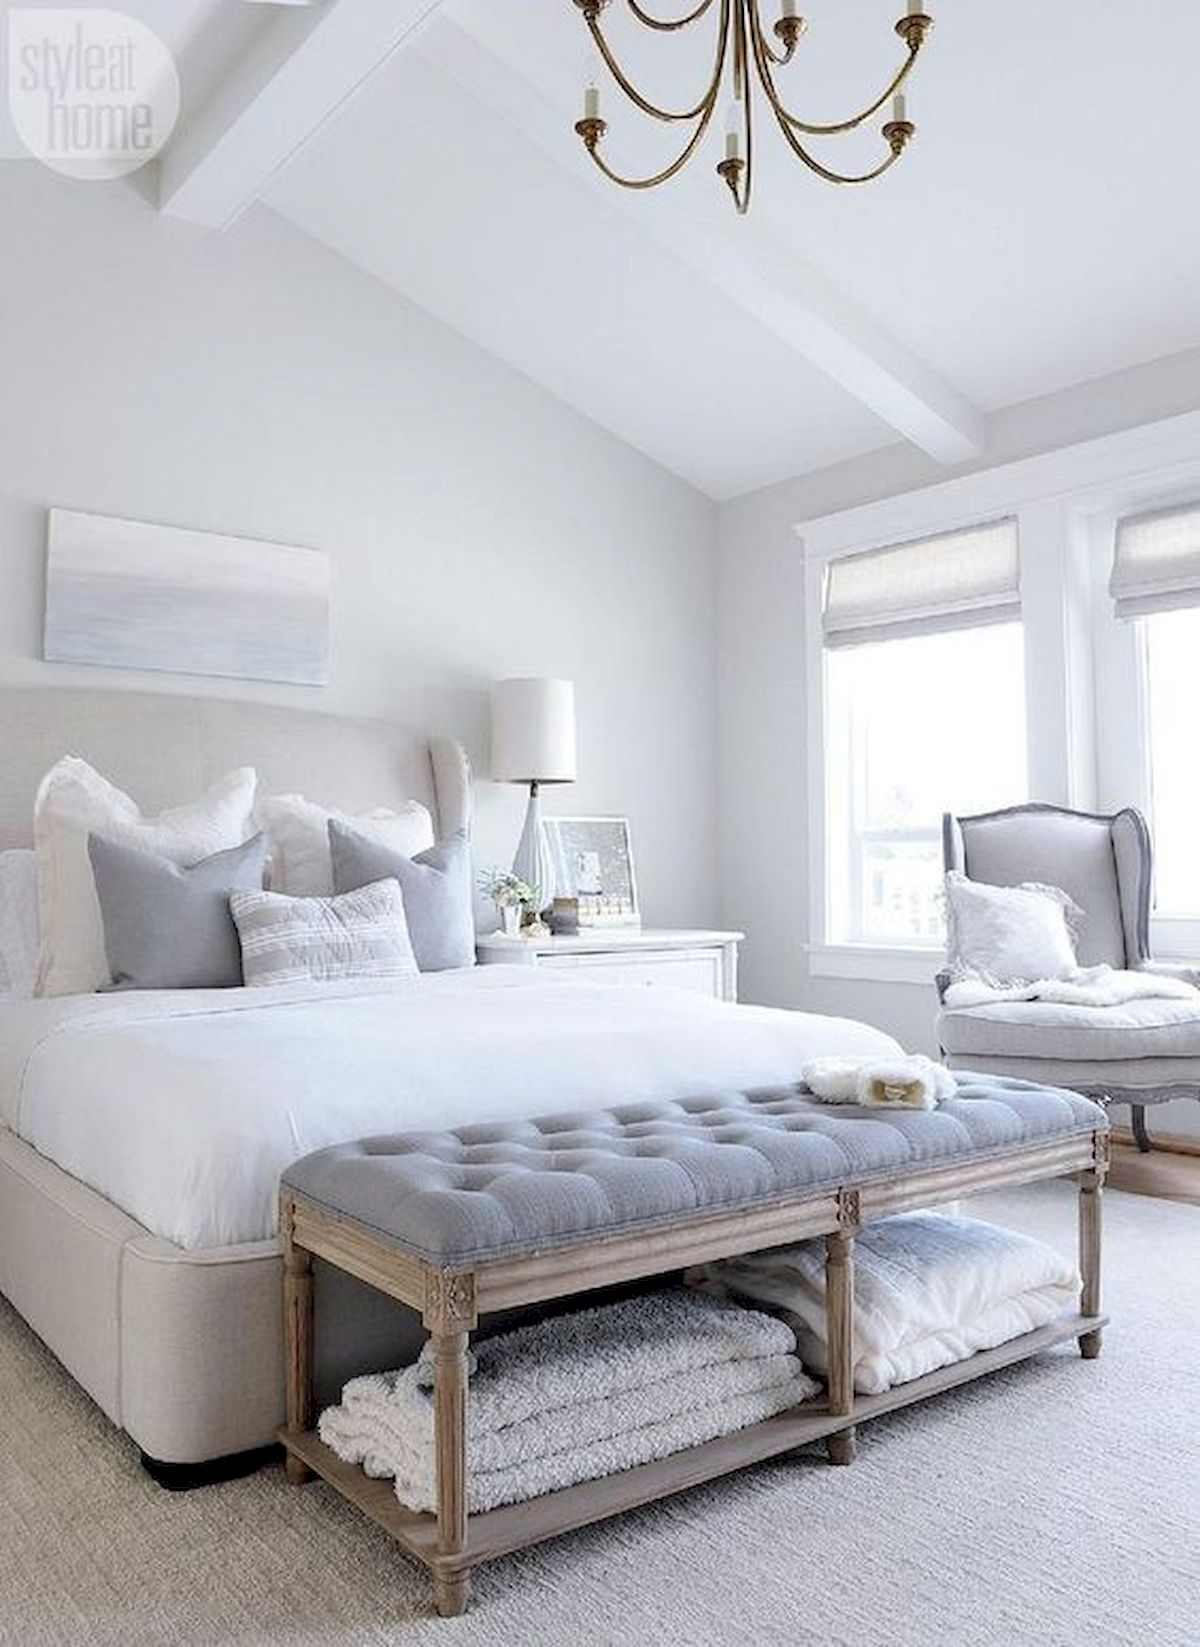 60 Beautiful Bedroom Decor and Design Ideas (30)